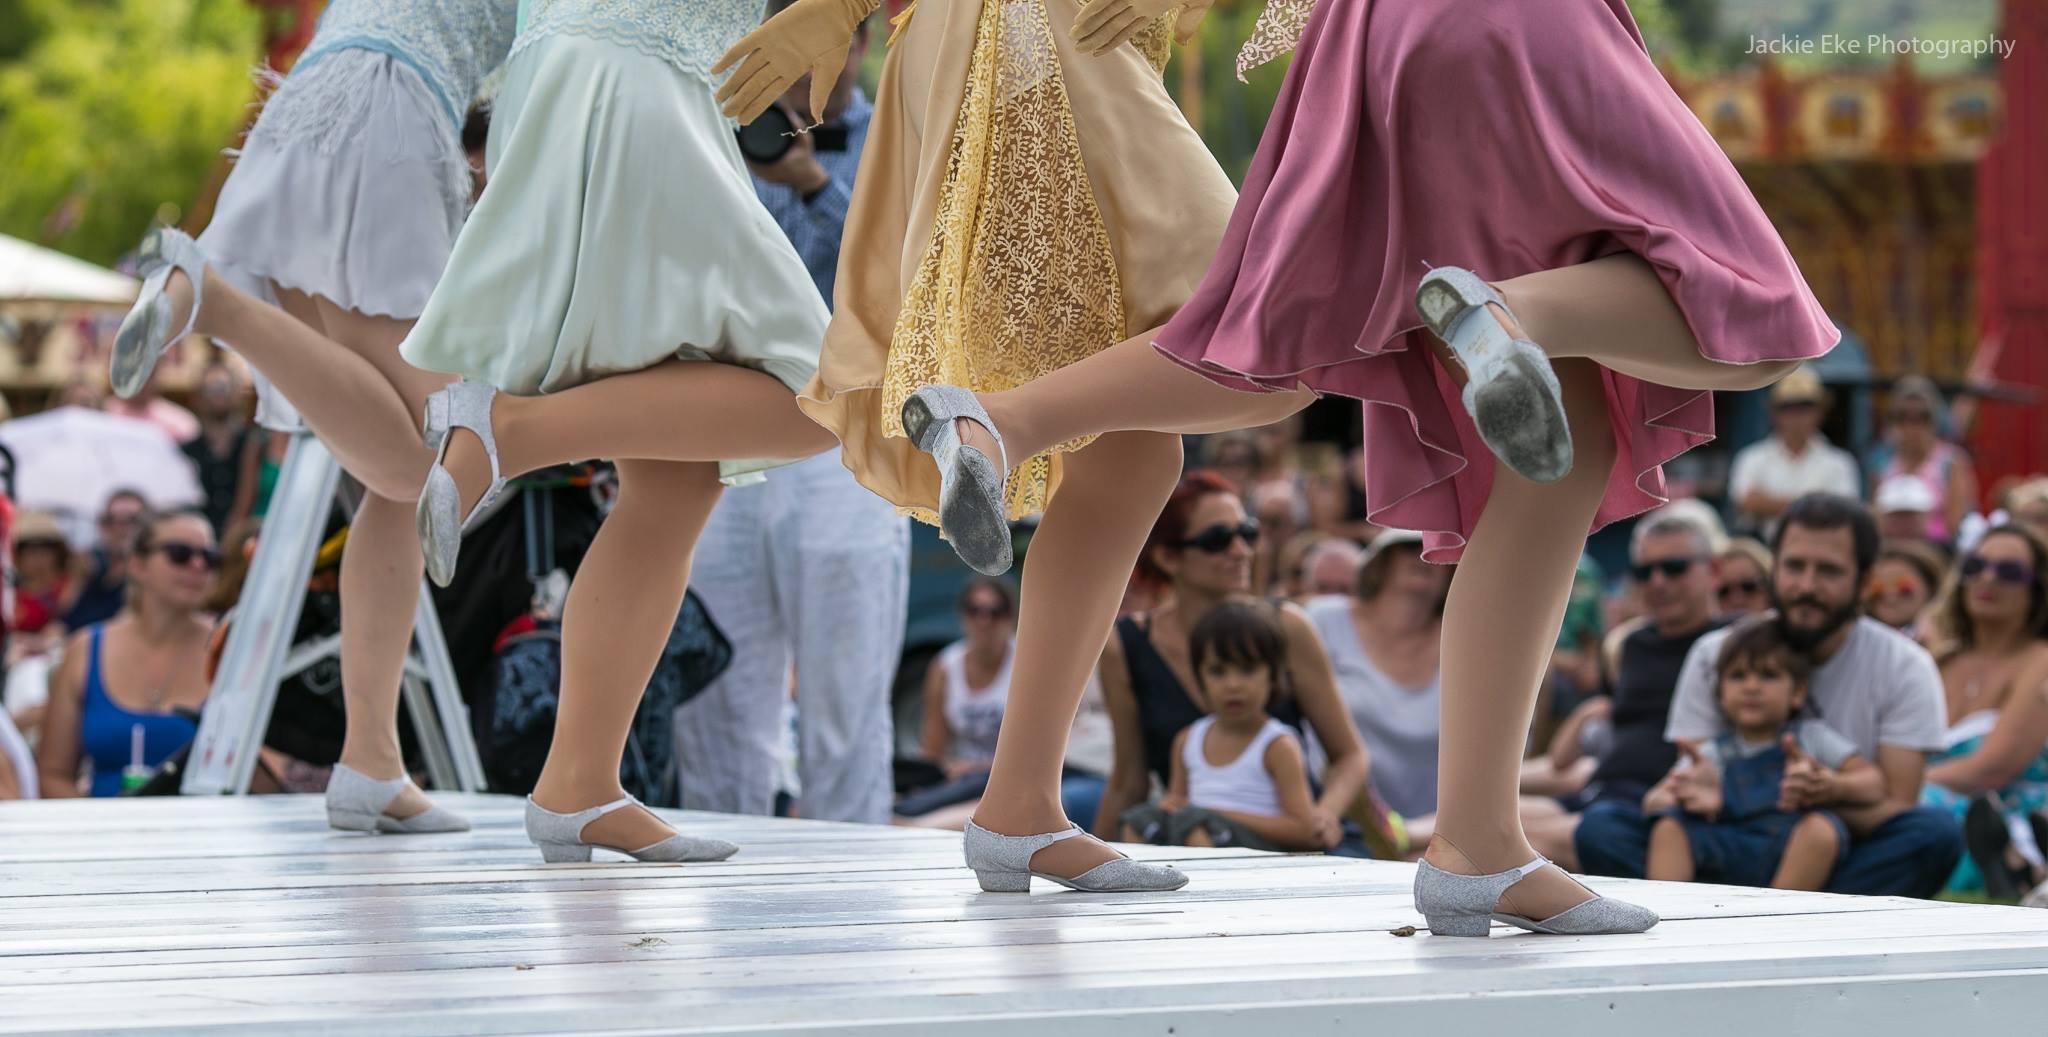 Savoy Kicks at Firle Vintage Fair 2016